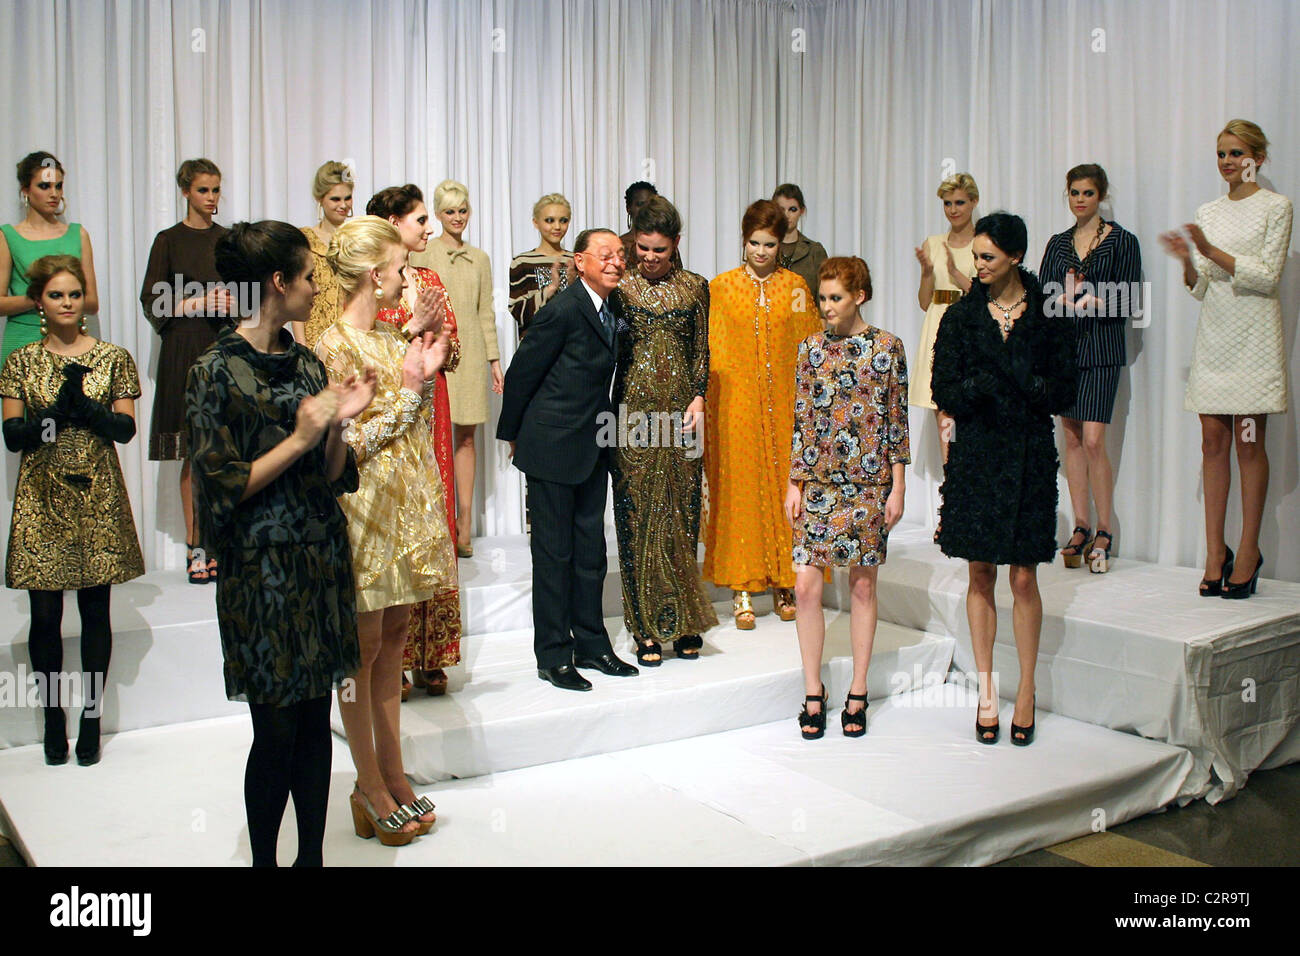 Models Wearing James Galanos Designs James Galanos Fashion Institute Stock Photo Alamy